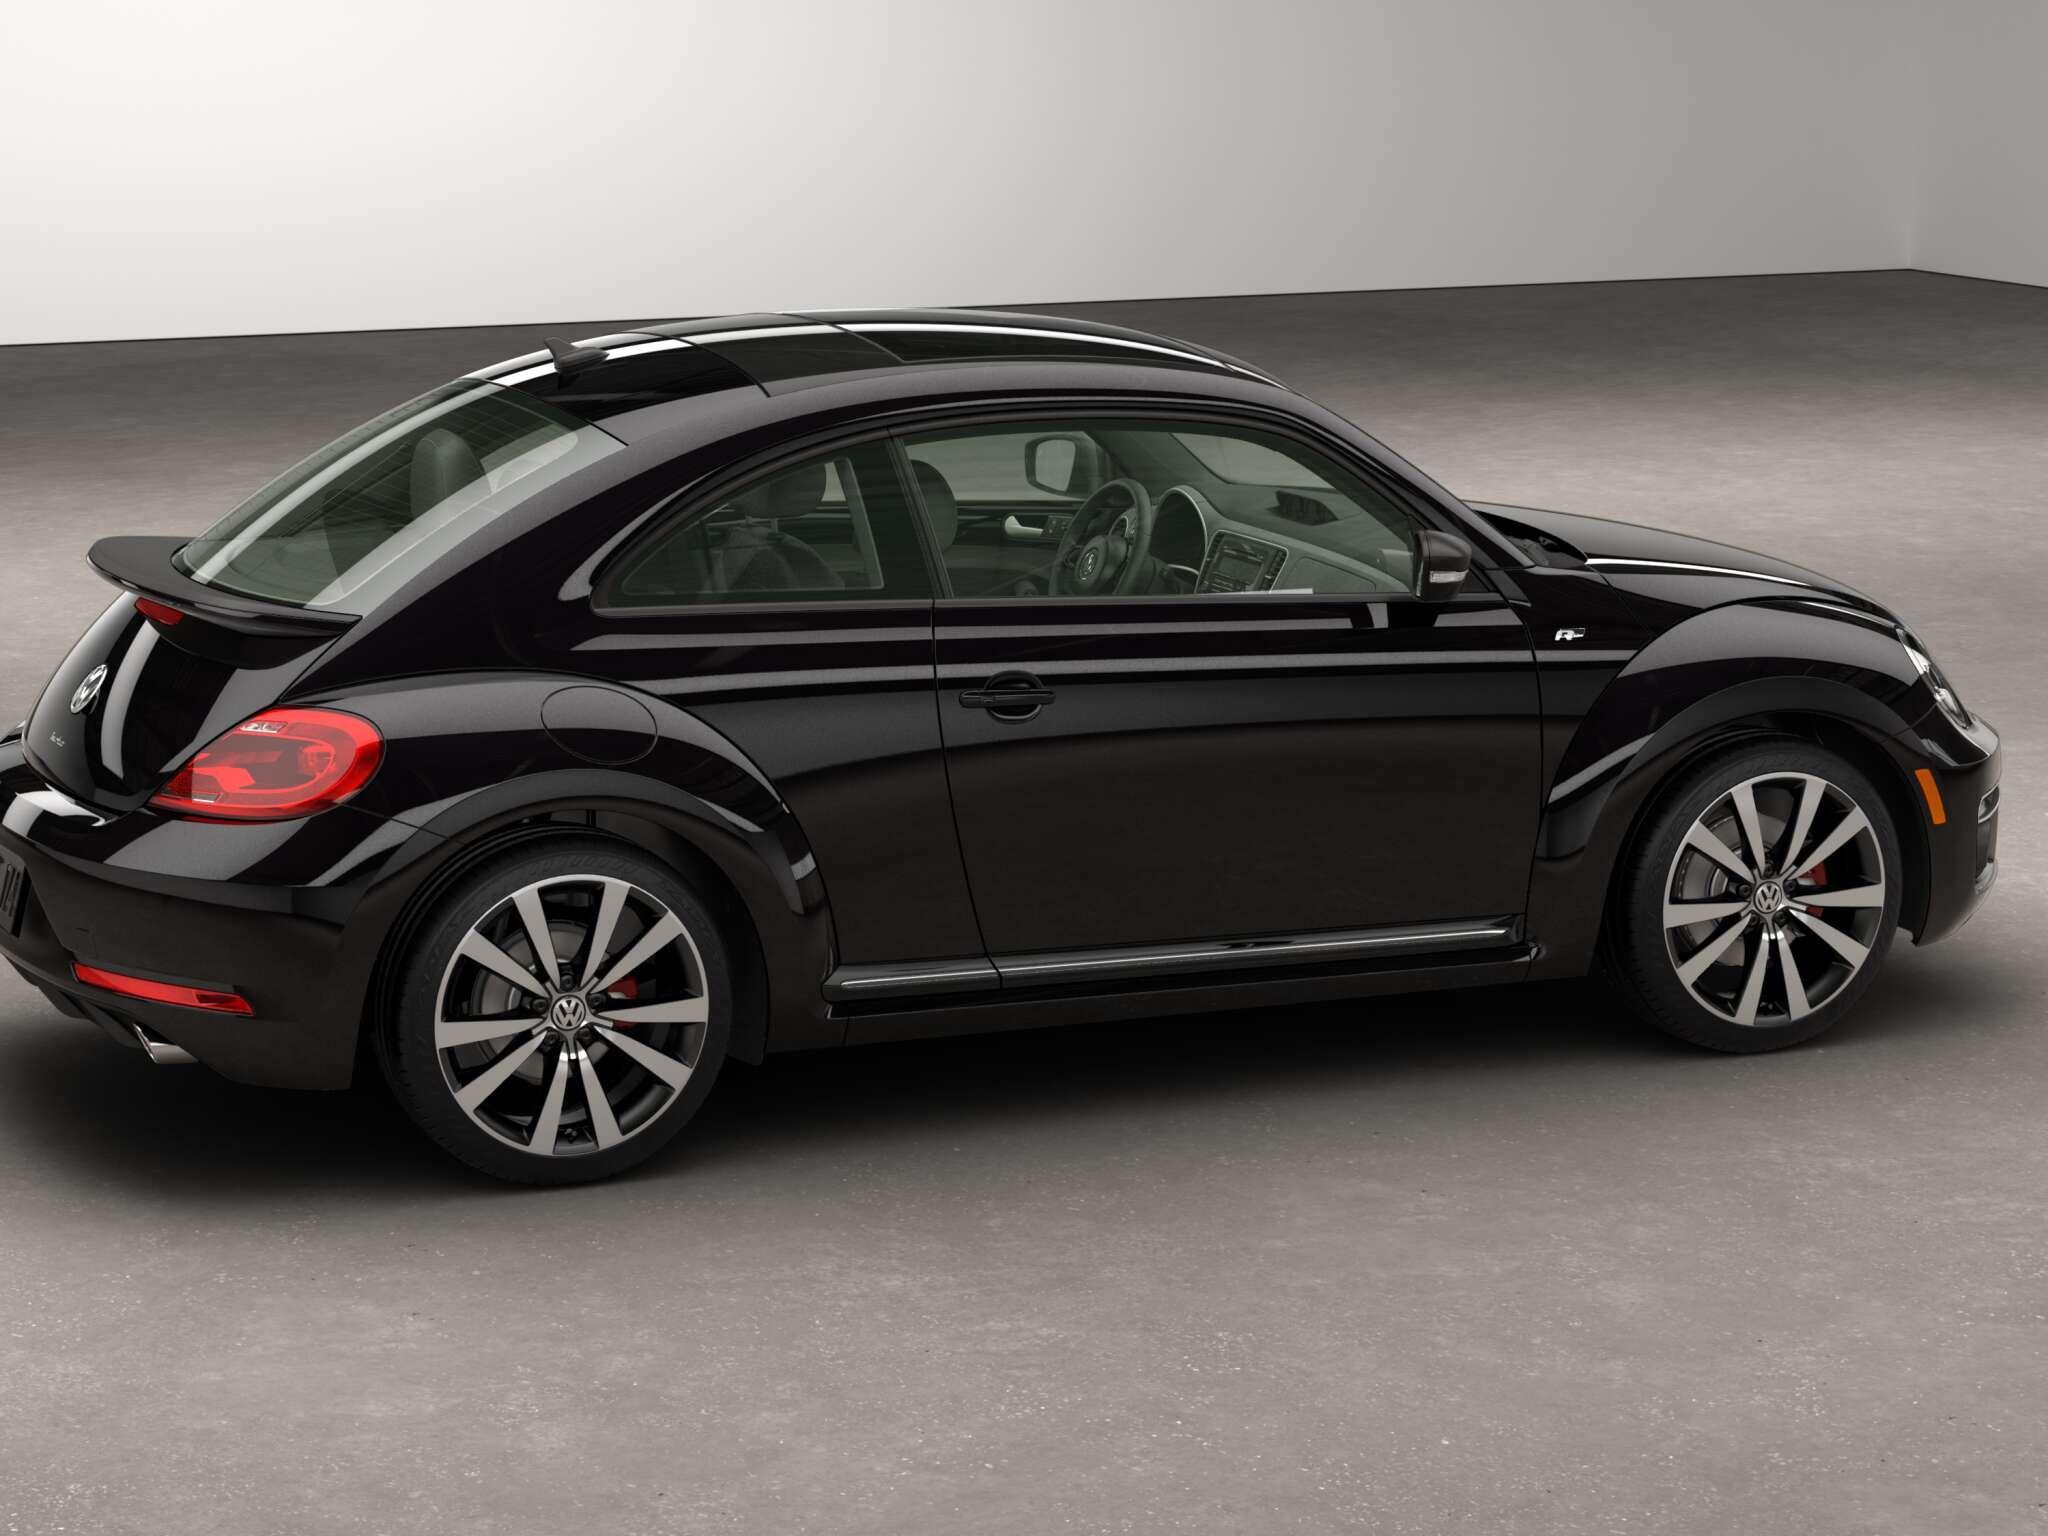 The 25+ best Volkswagen beetle 2015 ideas on Pinterest | Volkswagen beetles, Volkswagen beetle ...